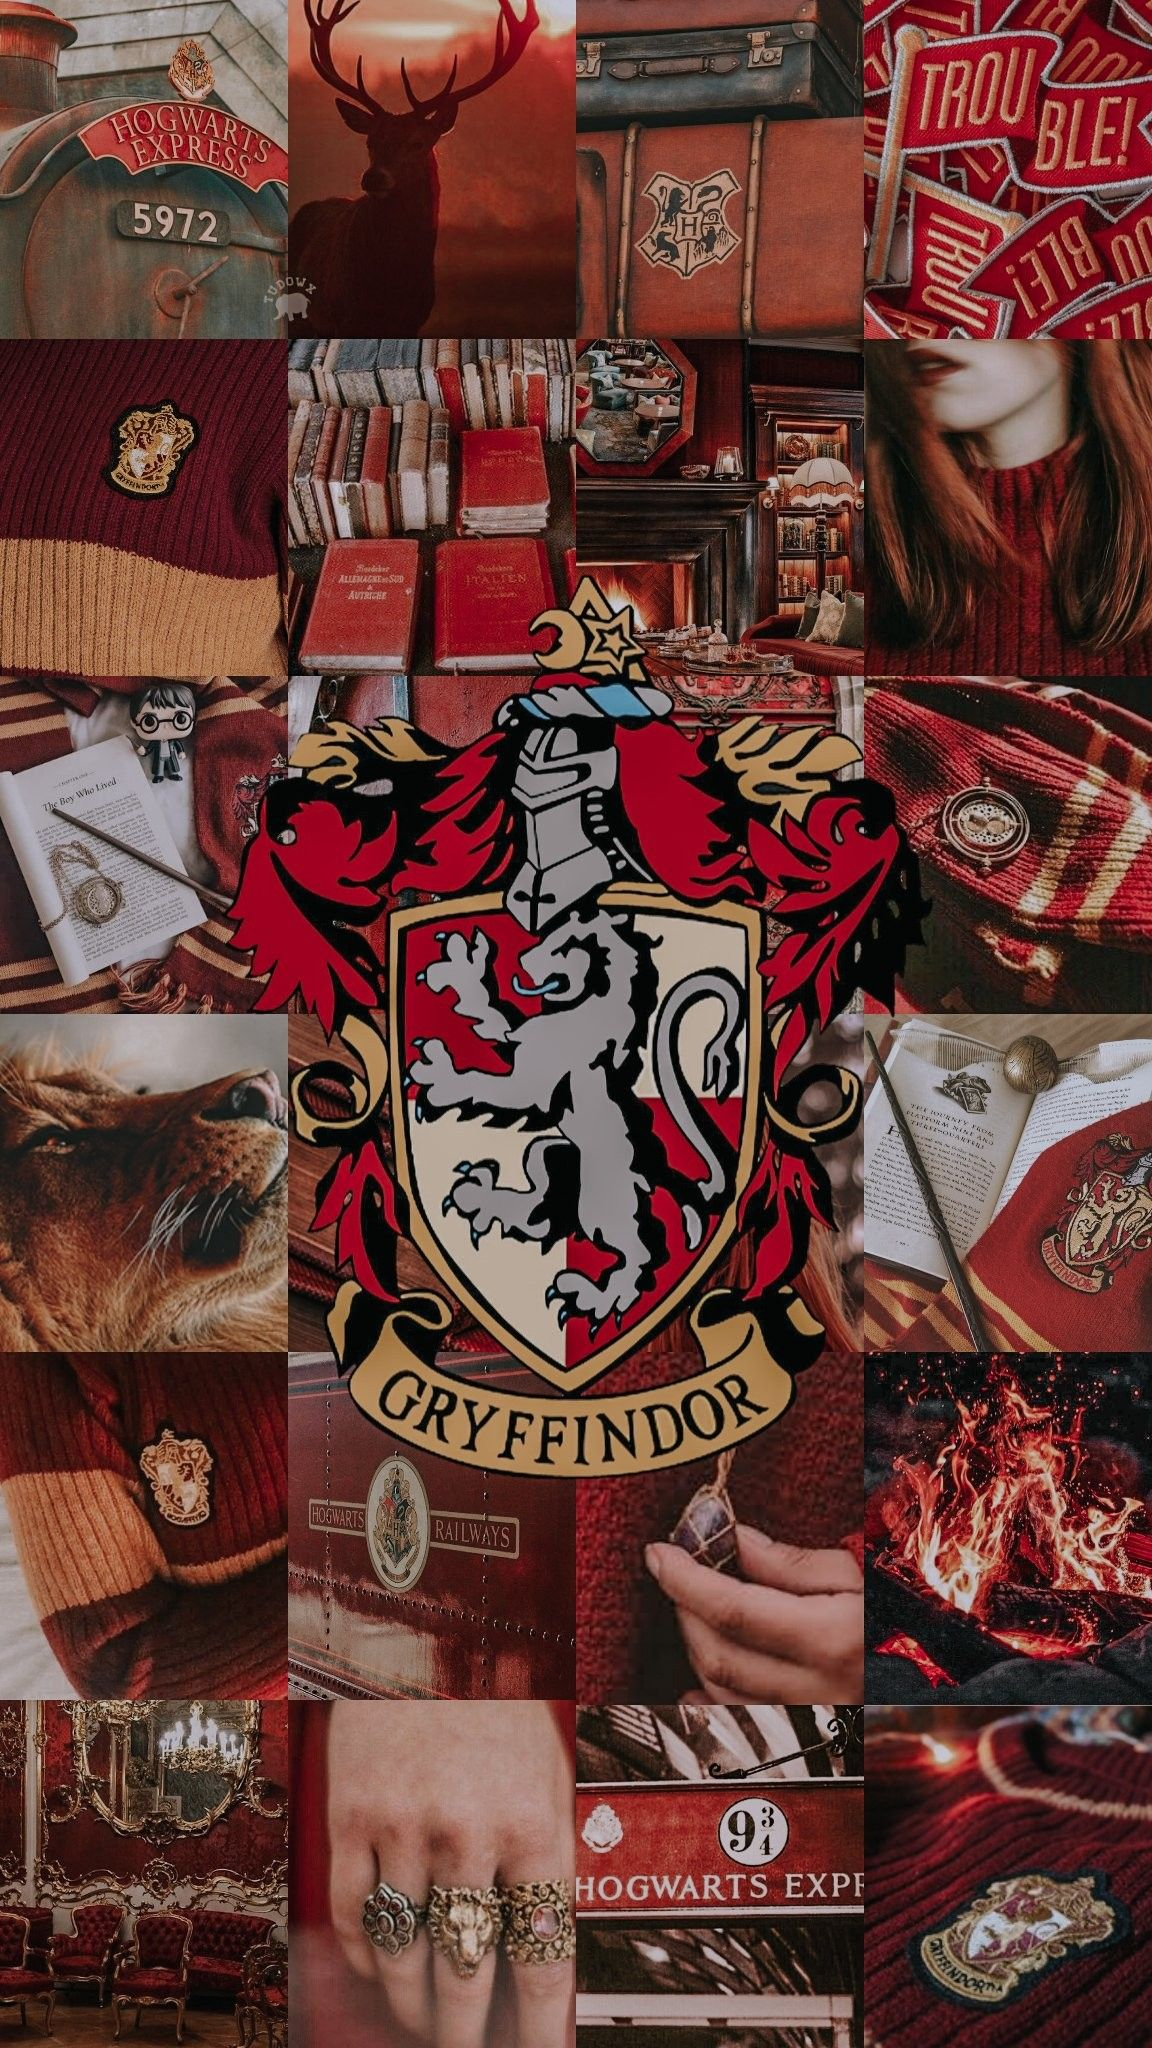 G R Y F F I N D O R Harry Potter Wallpaper Harry Potter Background Harry Potter Pictures